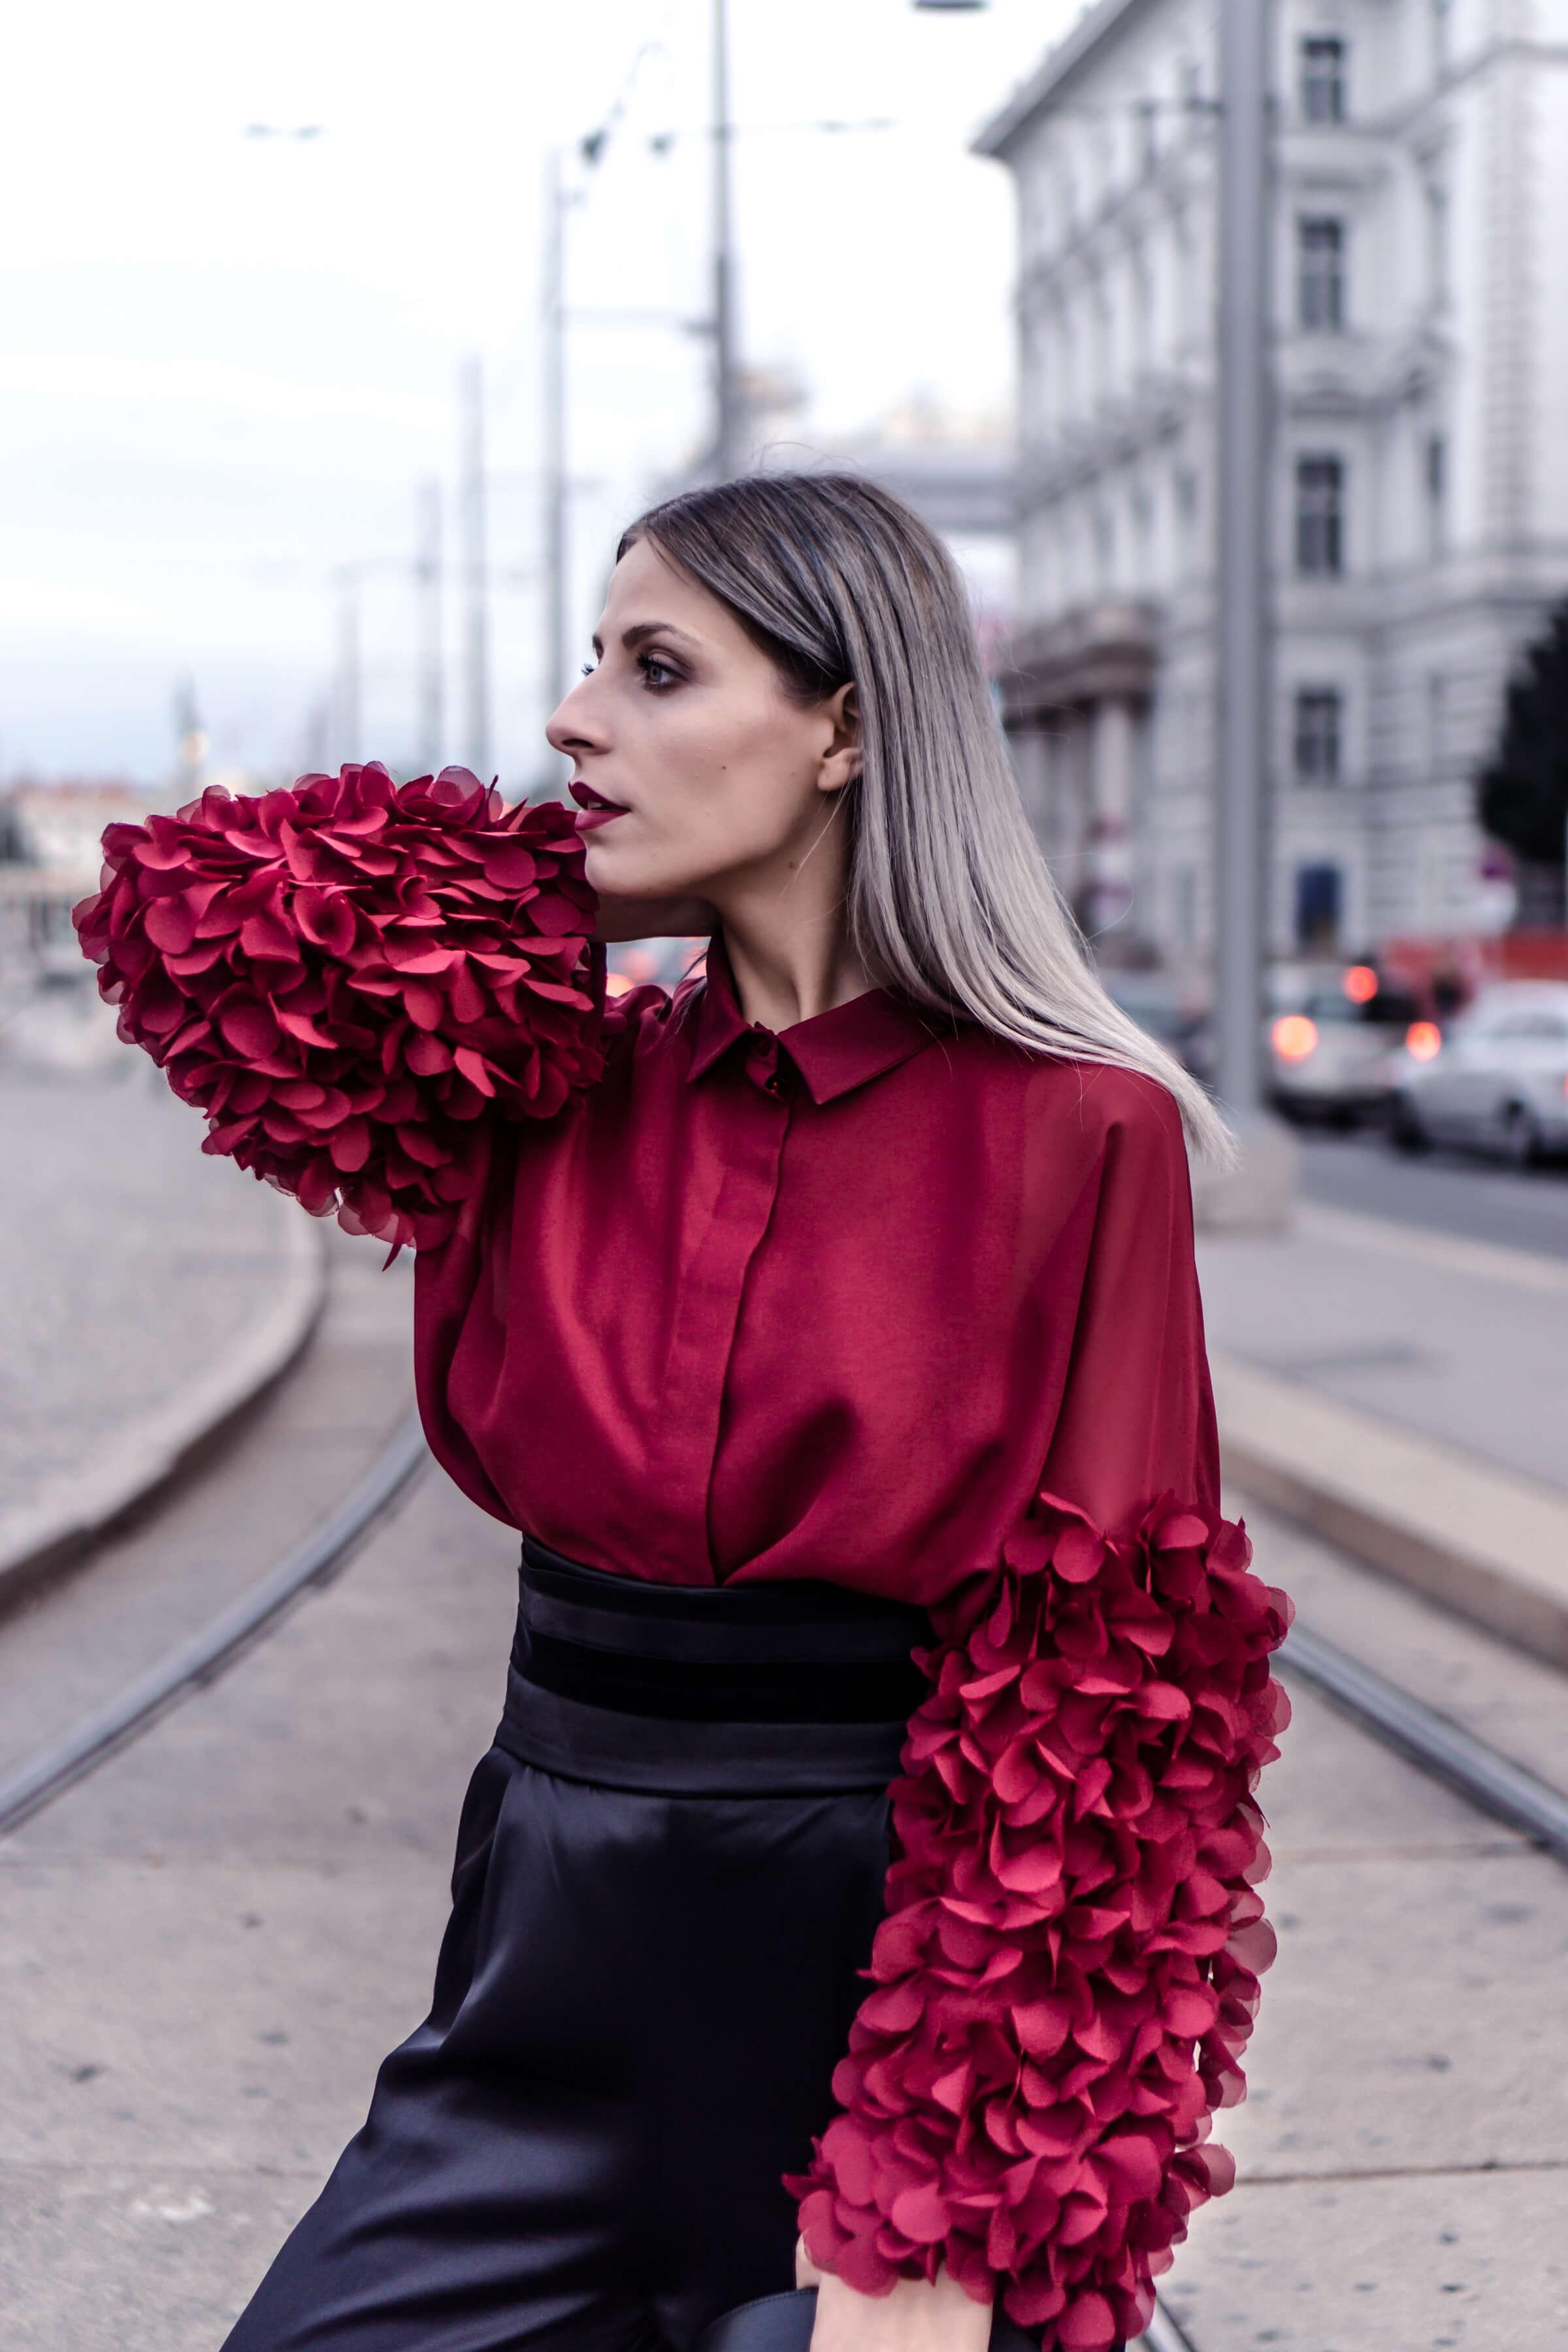 Extravagante Mode in Wien The Cosmopolitas